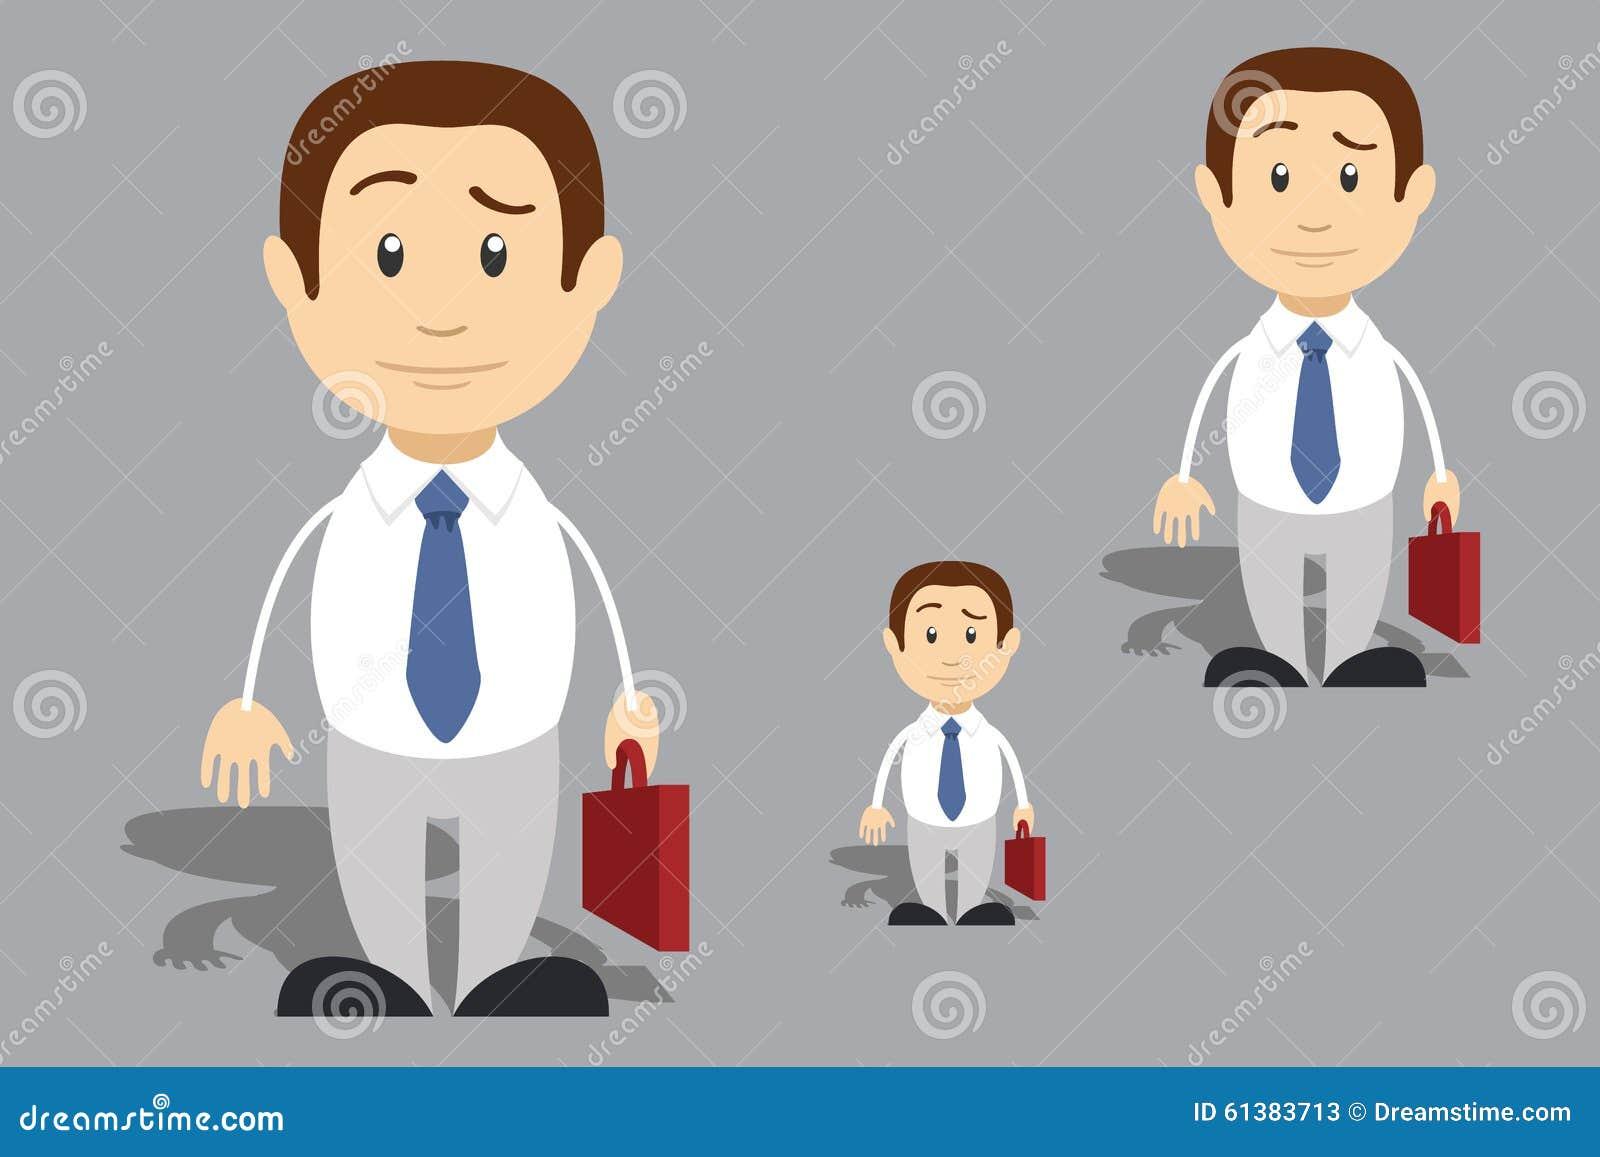 Cartoon Characters Jobs : Job stock illustration image